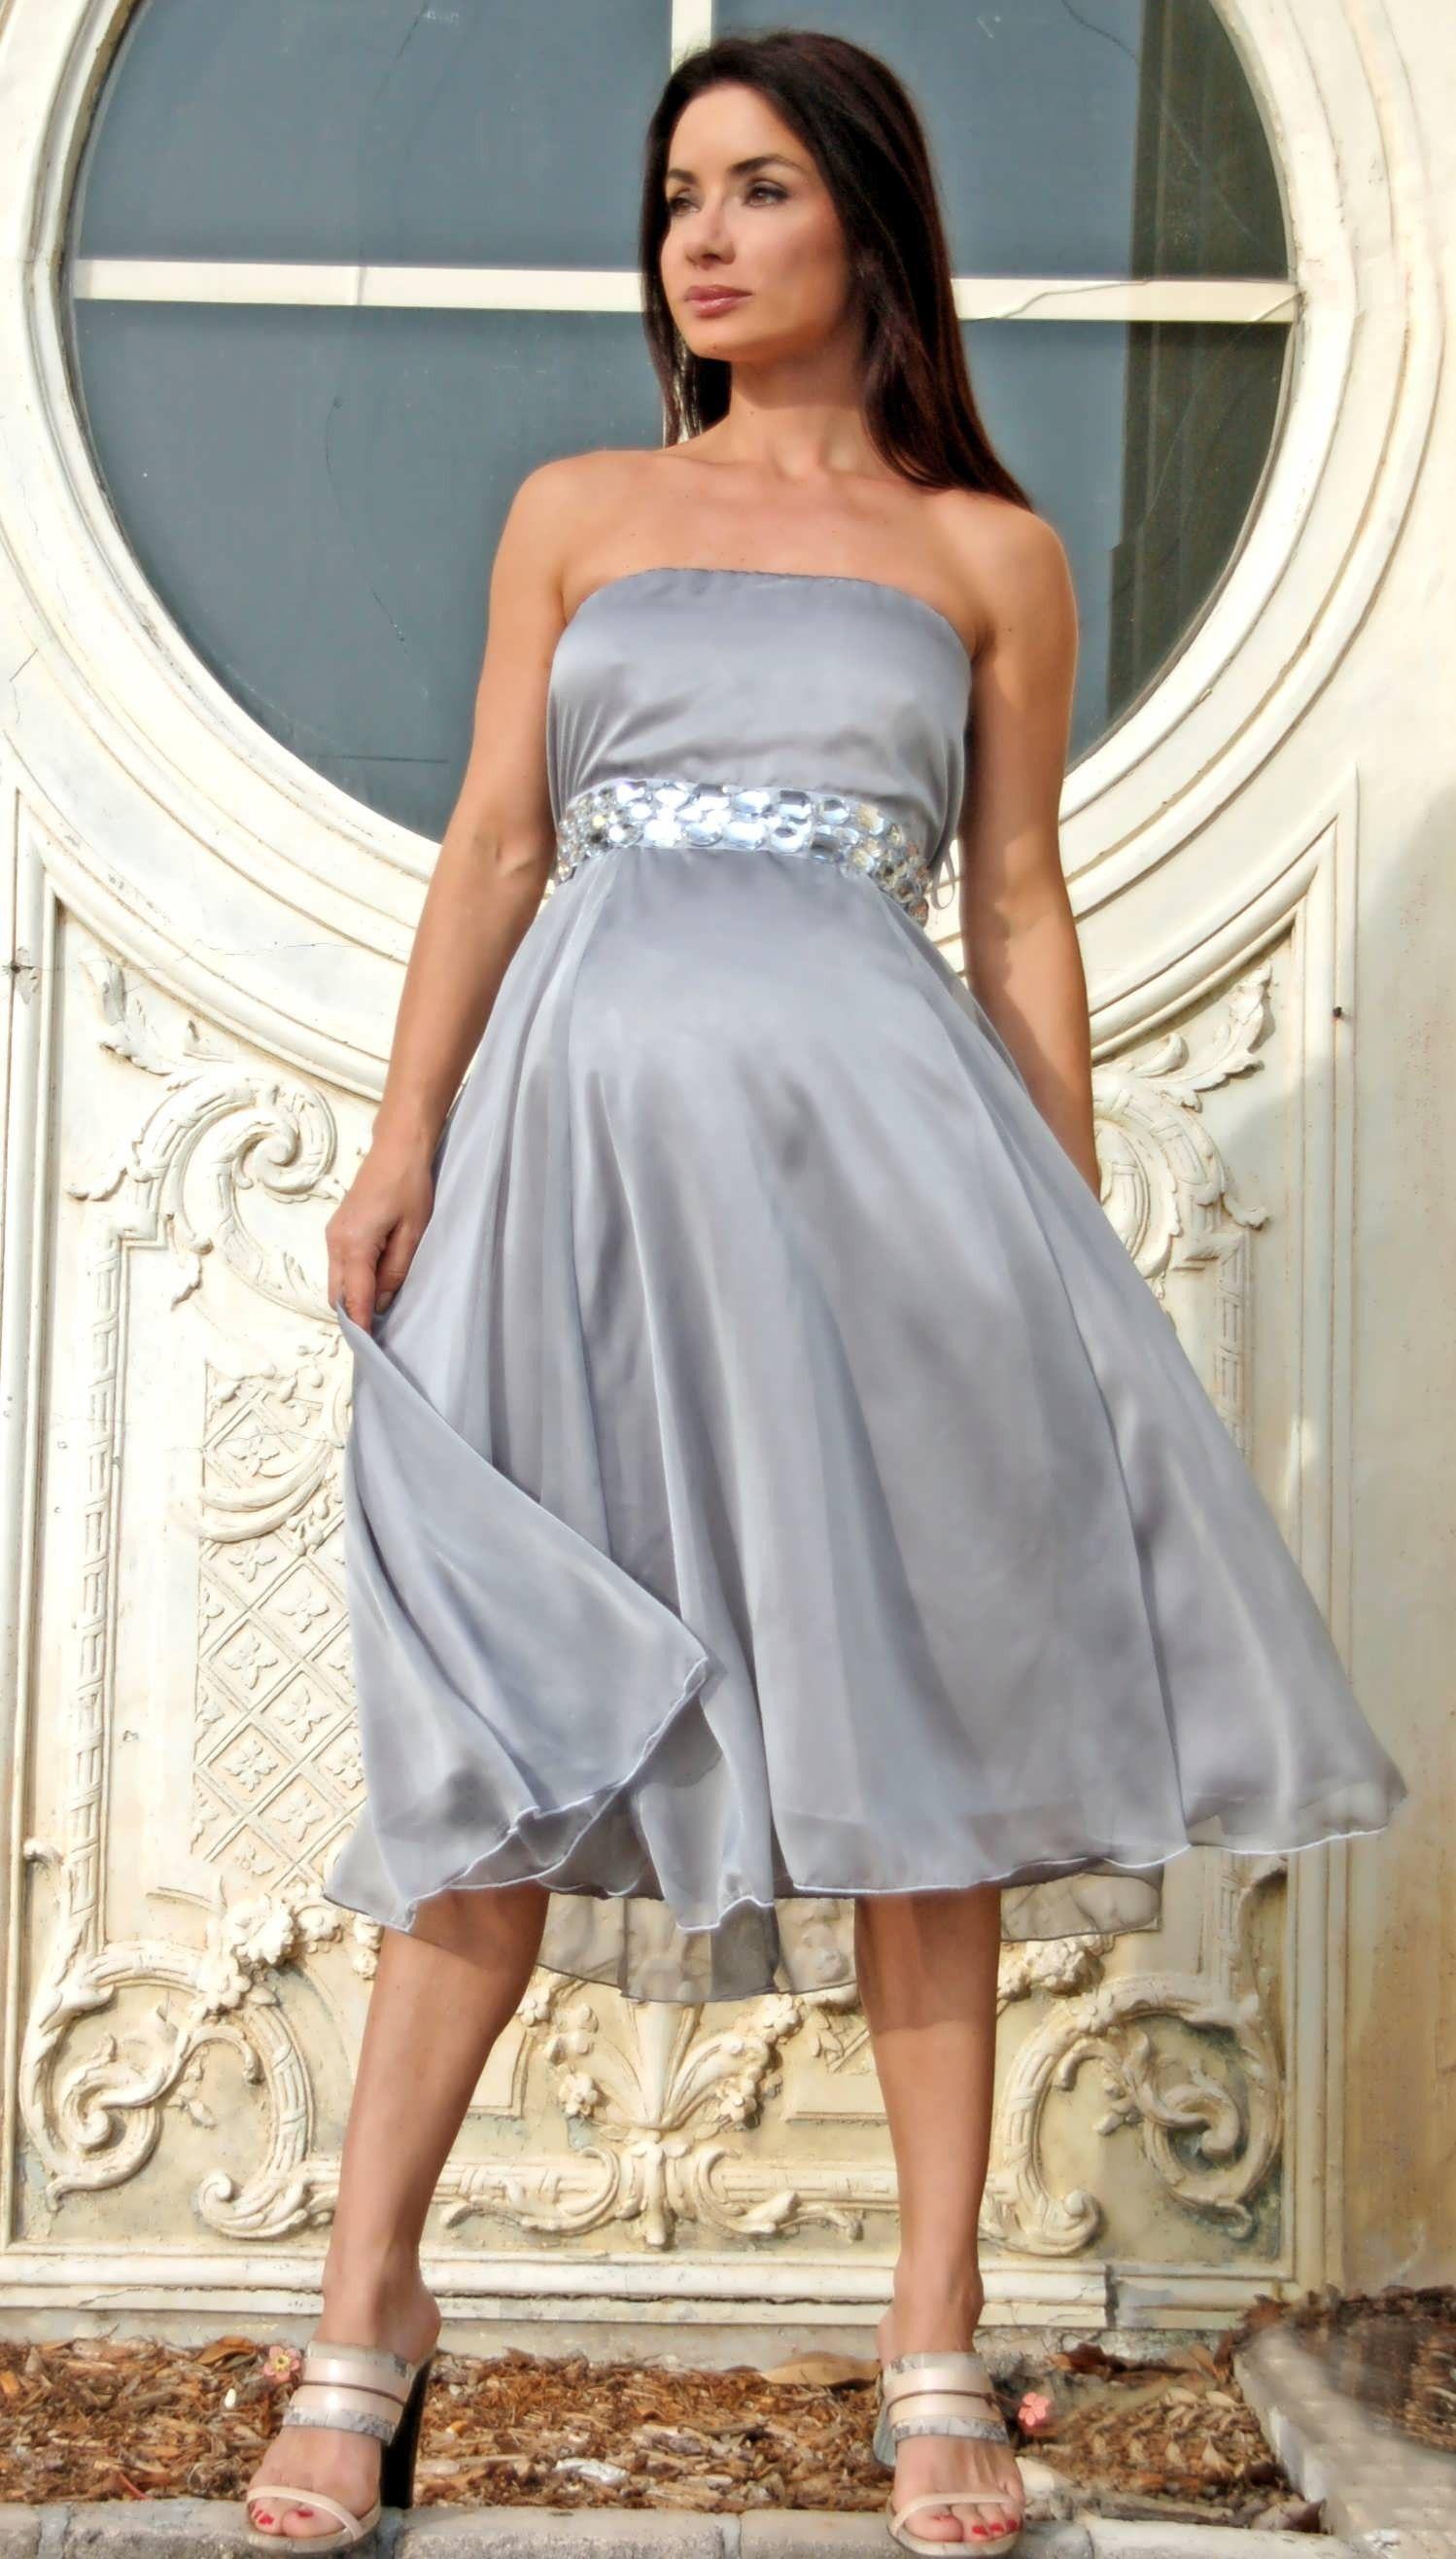 Platinum Diamond Audrey Maternity Gown Maternity Dress by